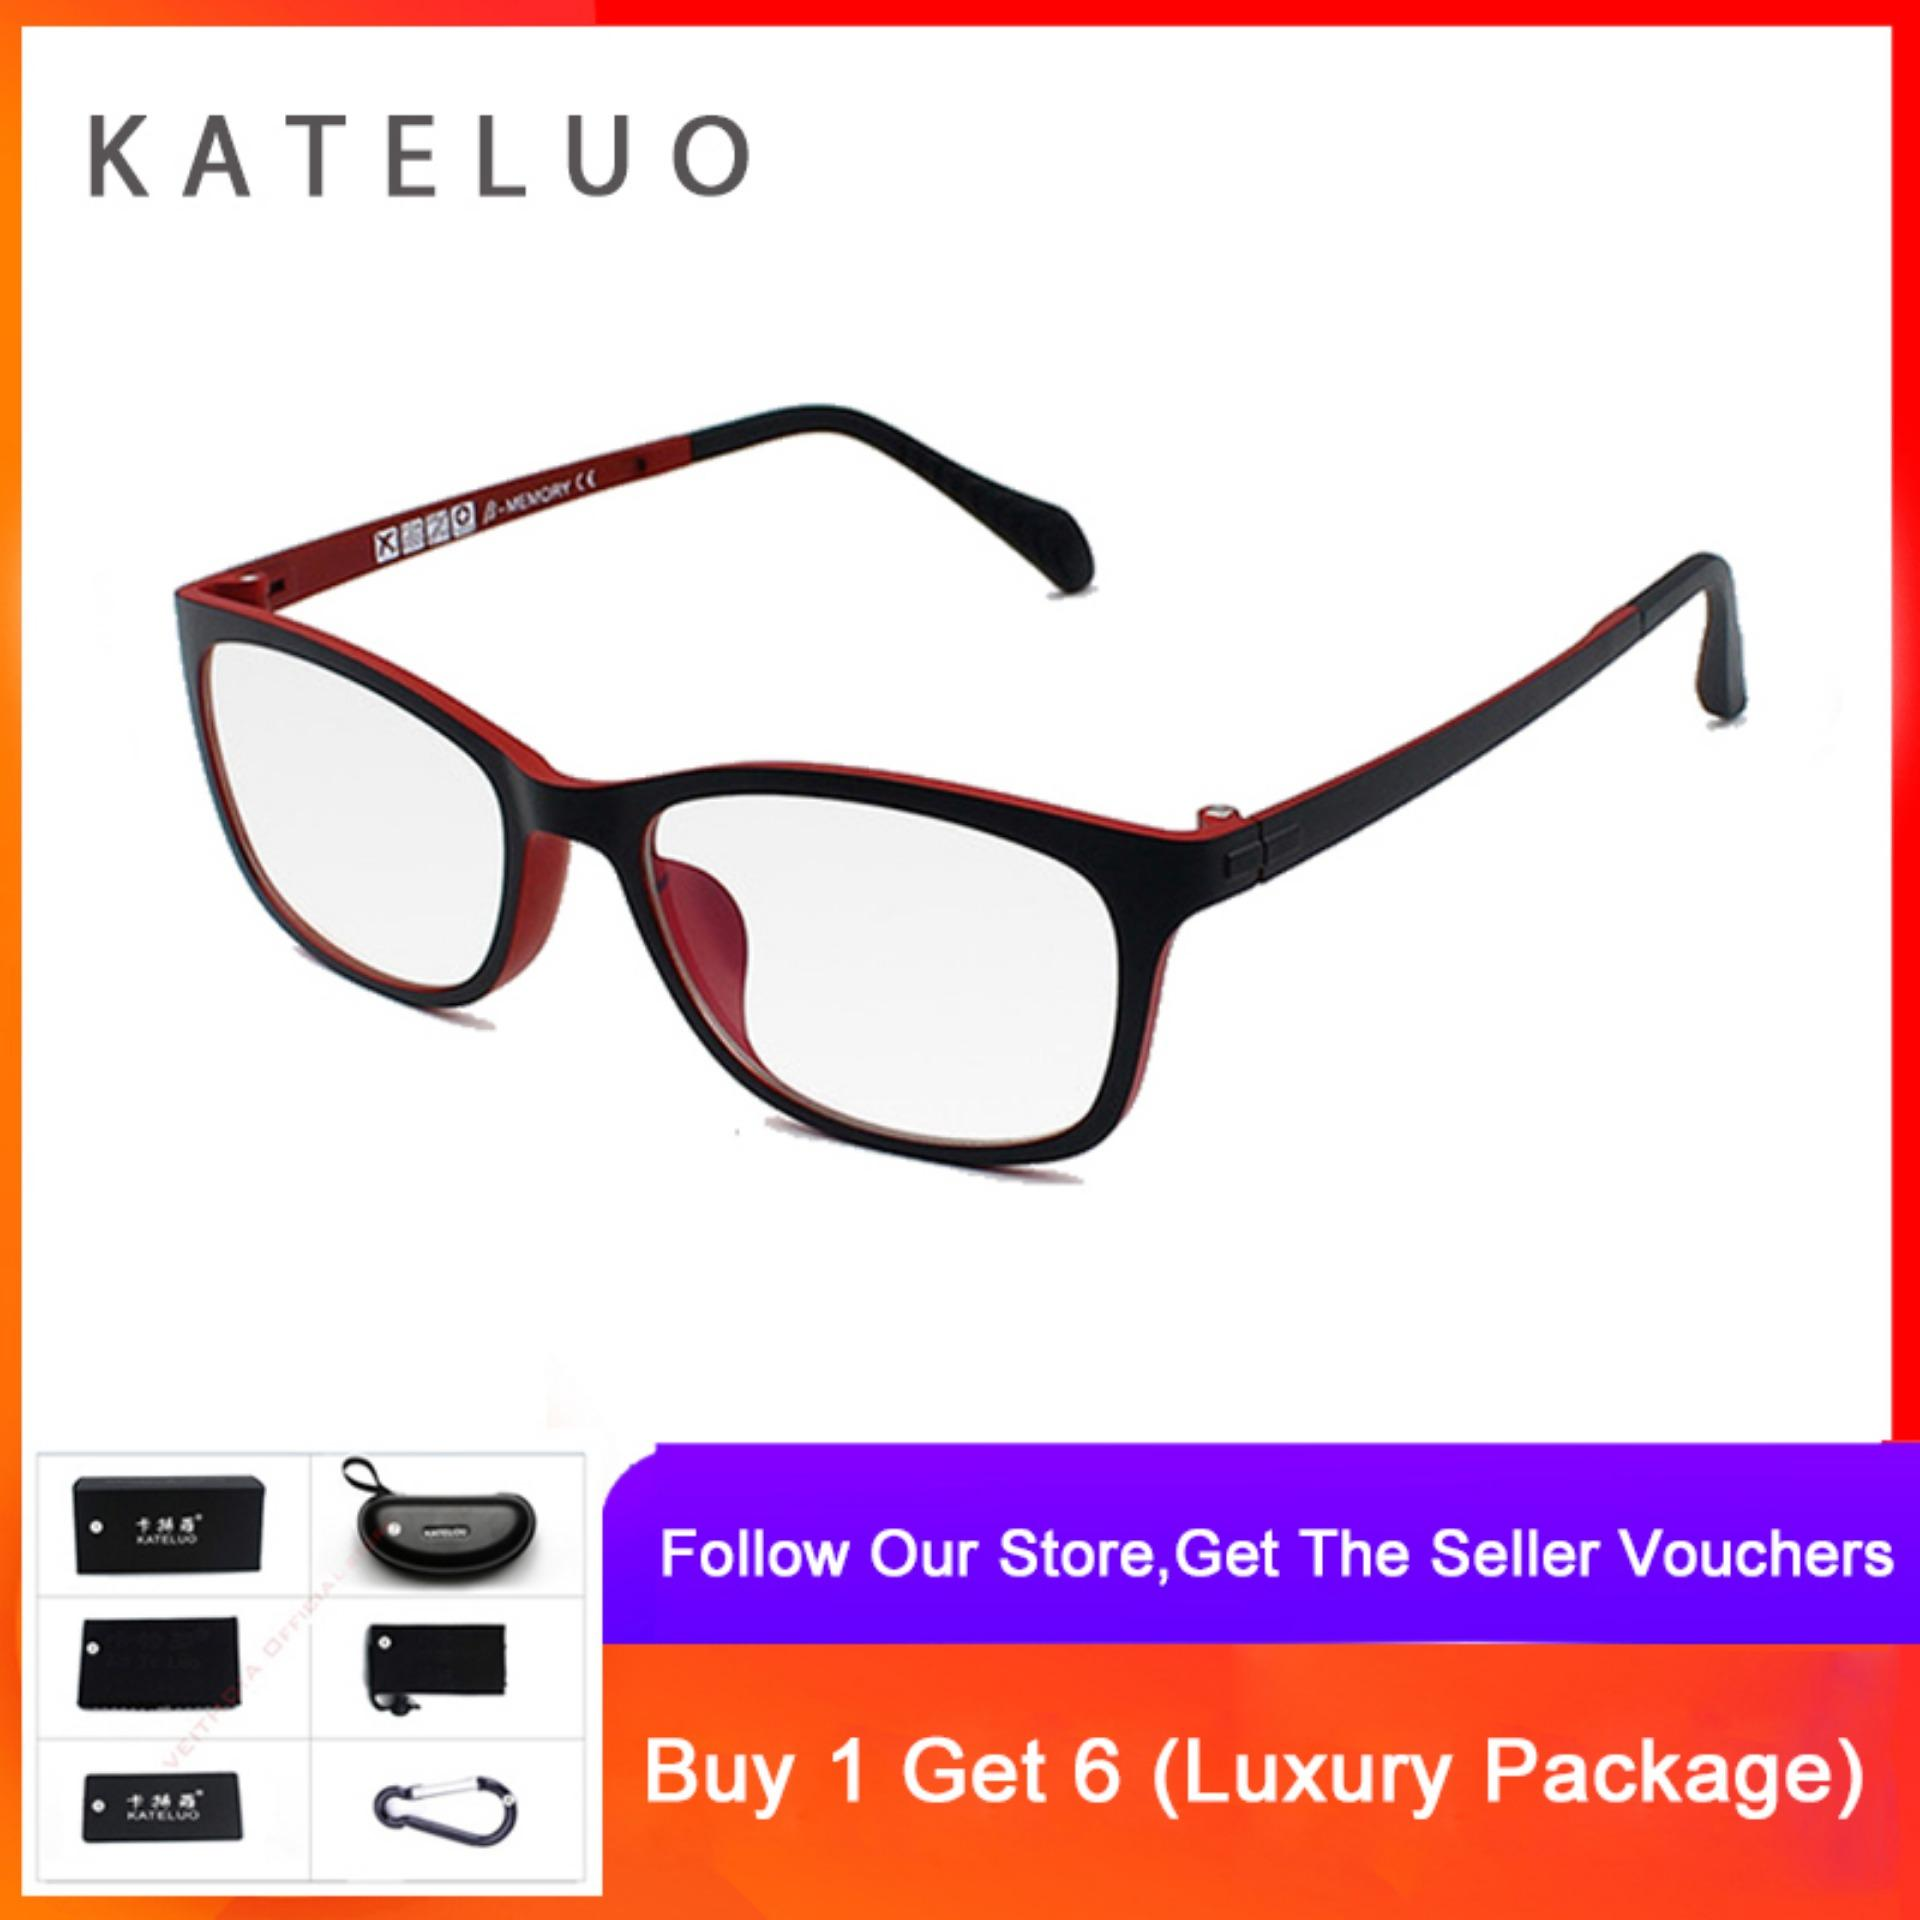 COD+Pengiriman Gratis KATELUO Komputer Kacamata Anti Laser Kelelahan Radiasi-tahan Kacamata Bingkai Kacamata 13031